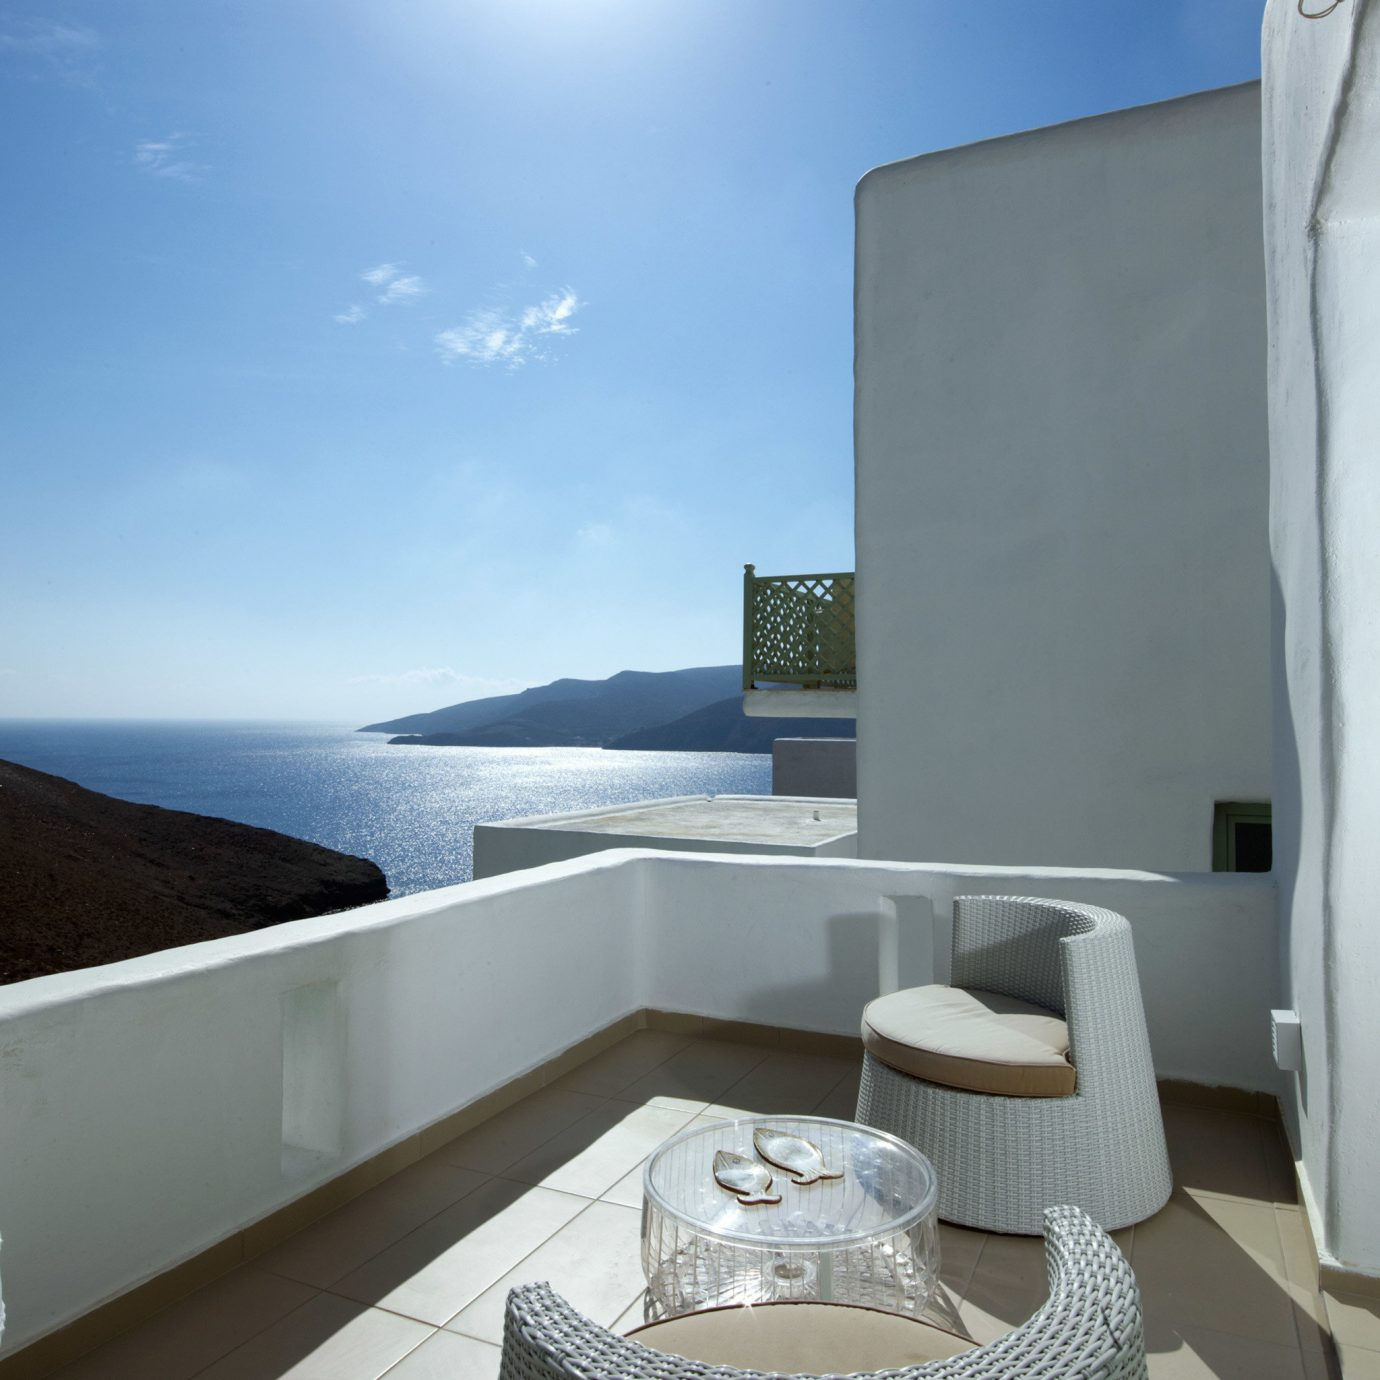 Beachfront Classic Deck Honeymoon Luxury Scenic views Suite property house swimming pool Villa home cottage